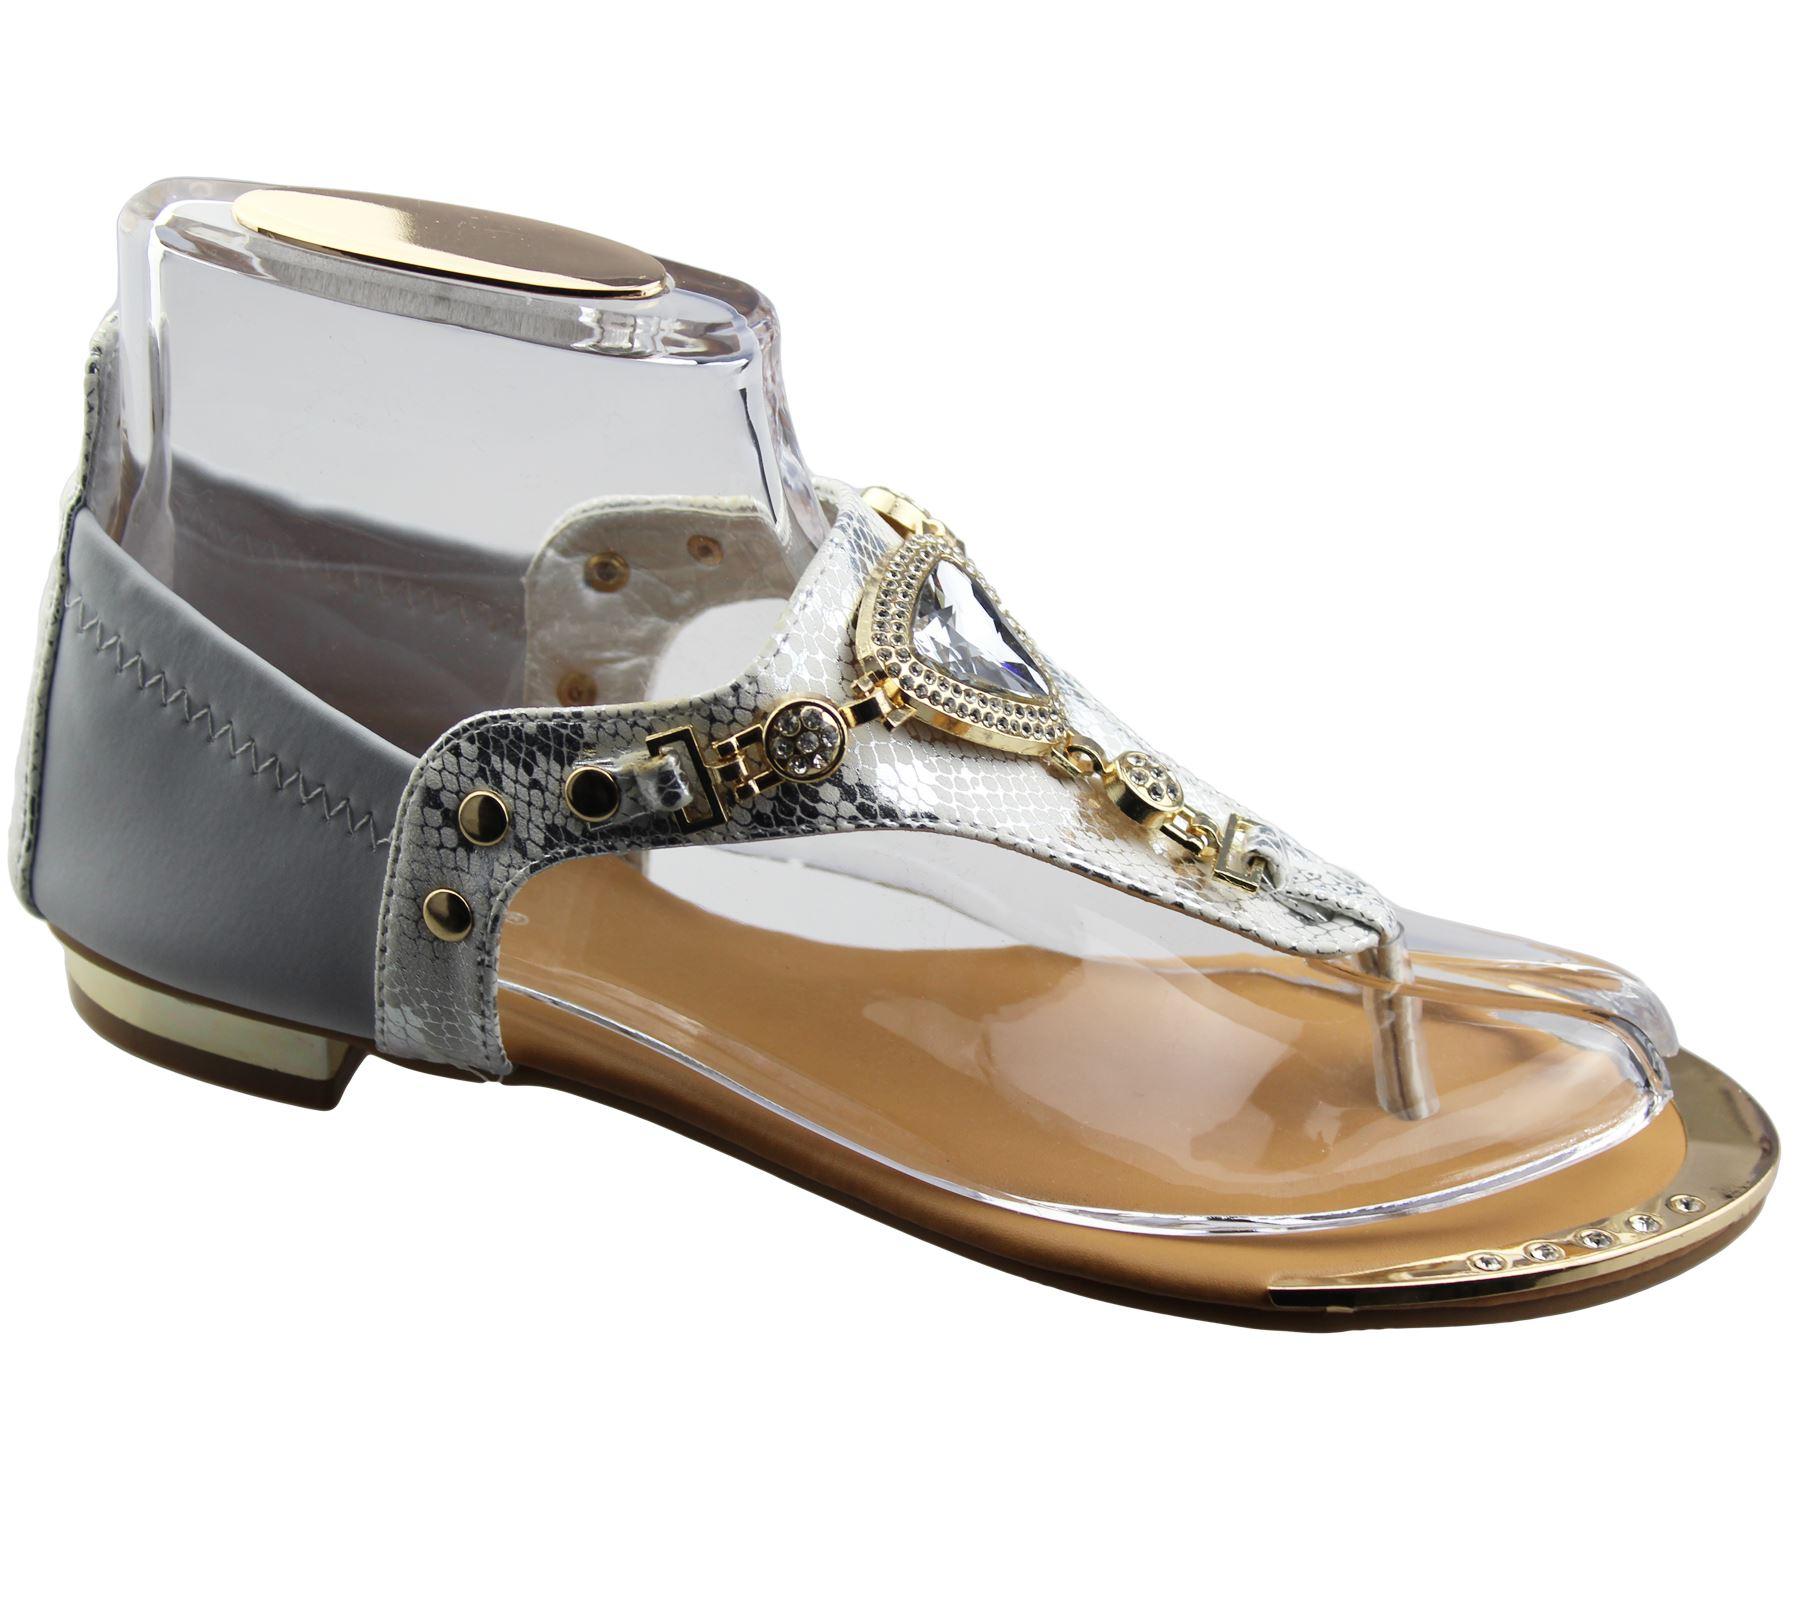 Womens-Flat-Summer-Sandals-Ladies-Diamante-Wedding-Toe-Post-Casual-Slipper thumbnail 9